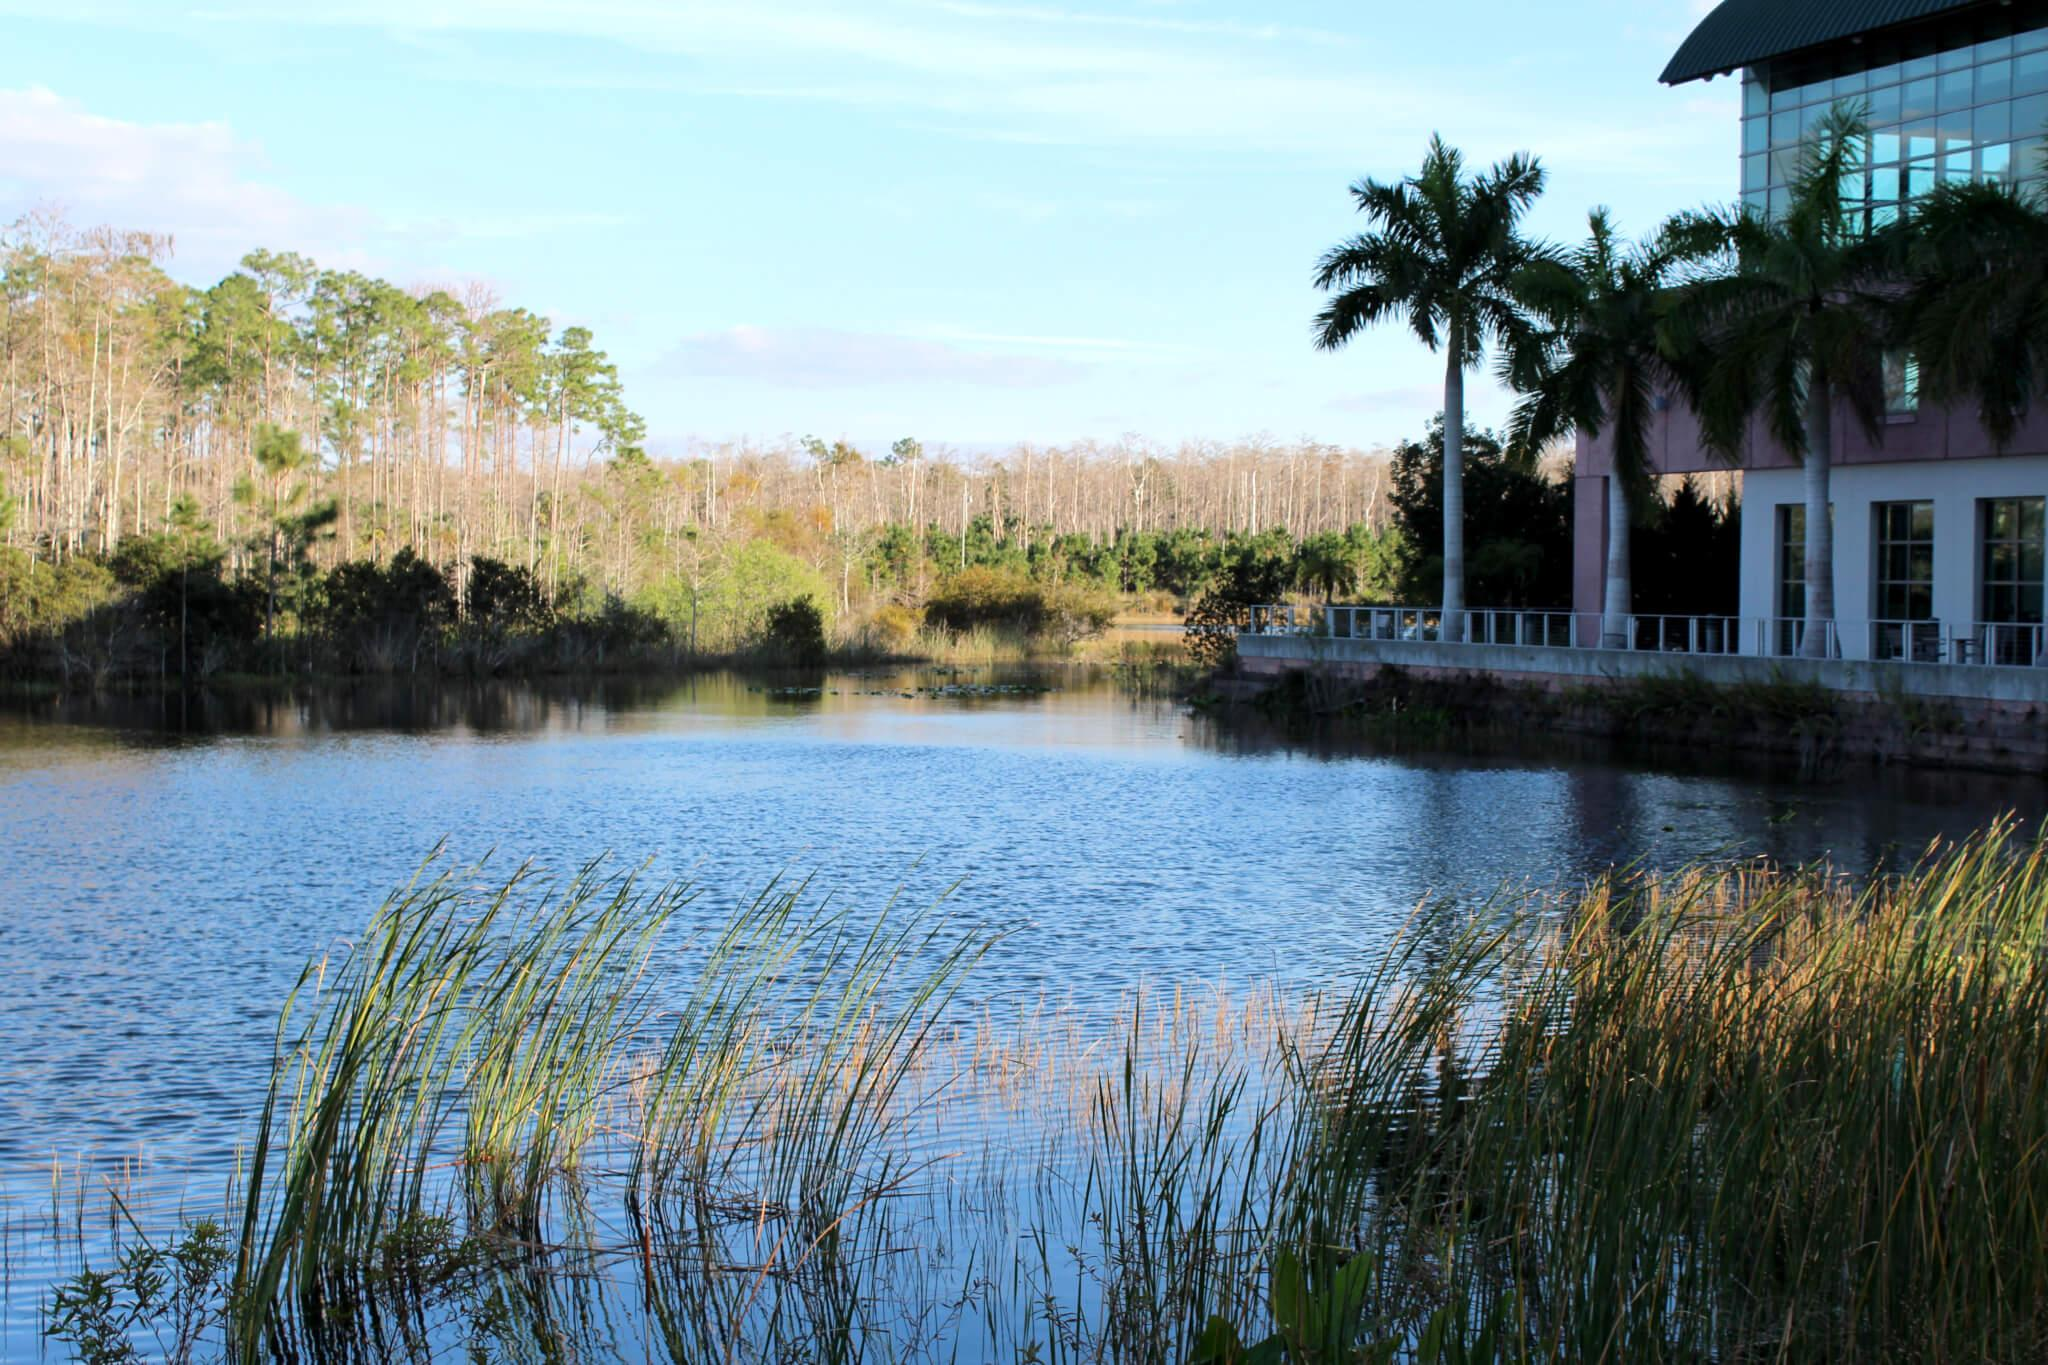 FGCU makes efforts in conserving biodiversity in Florida